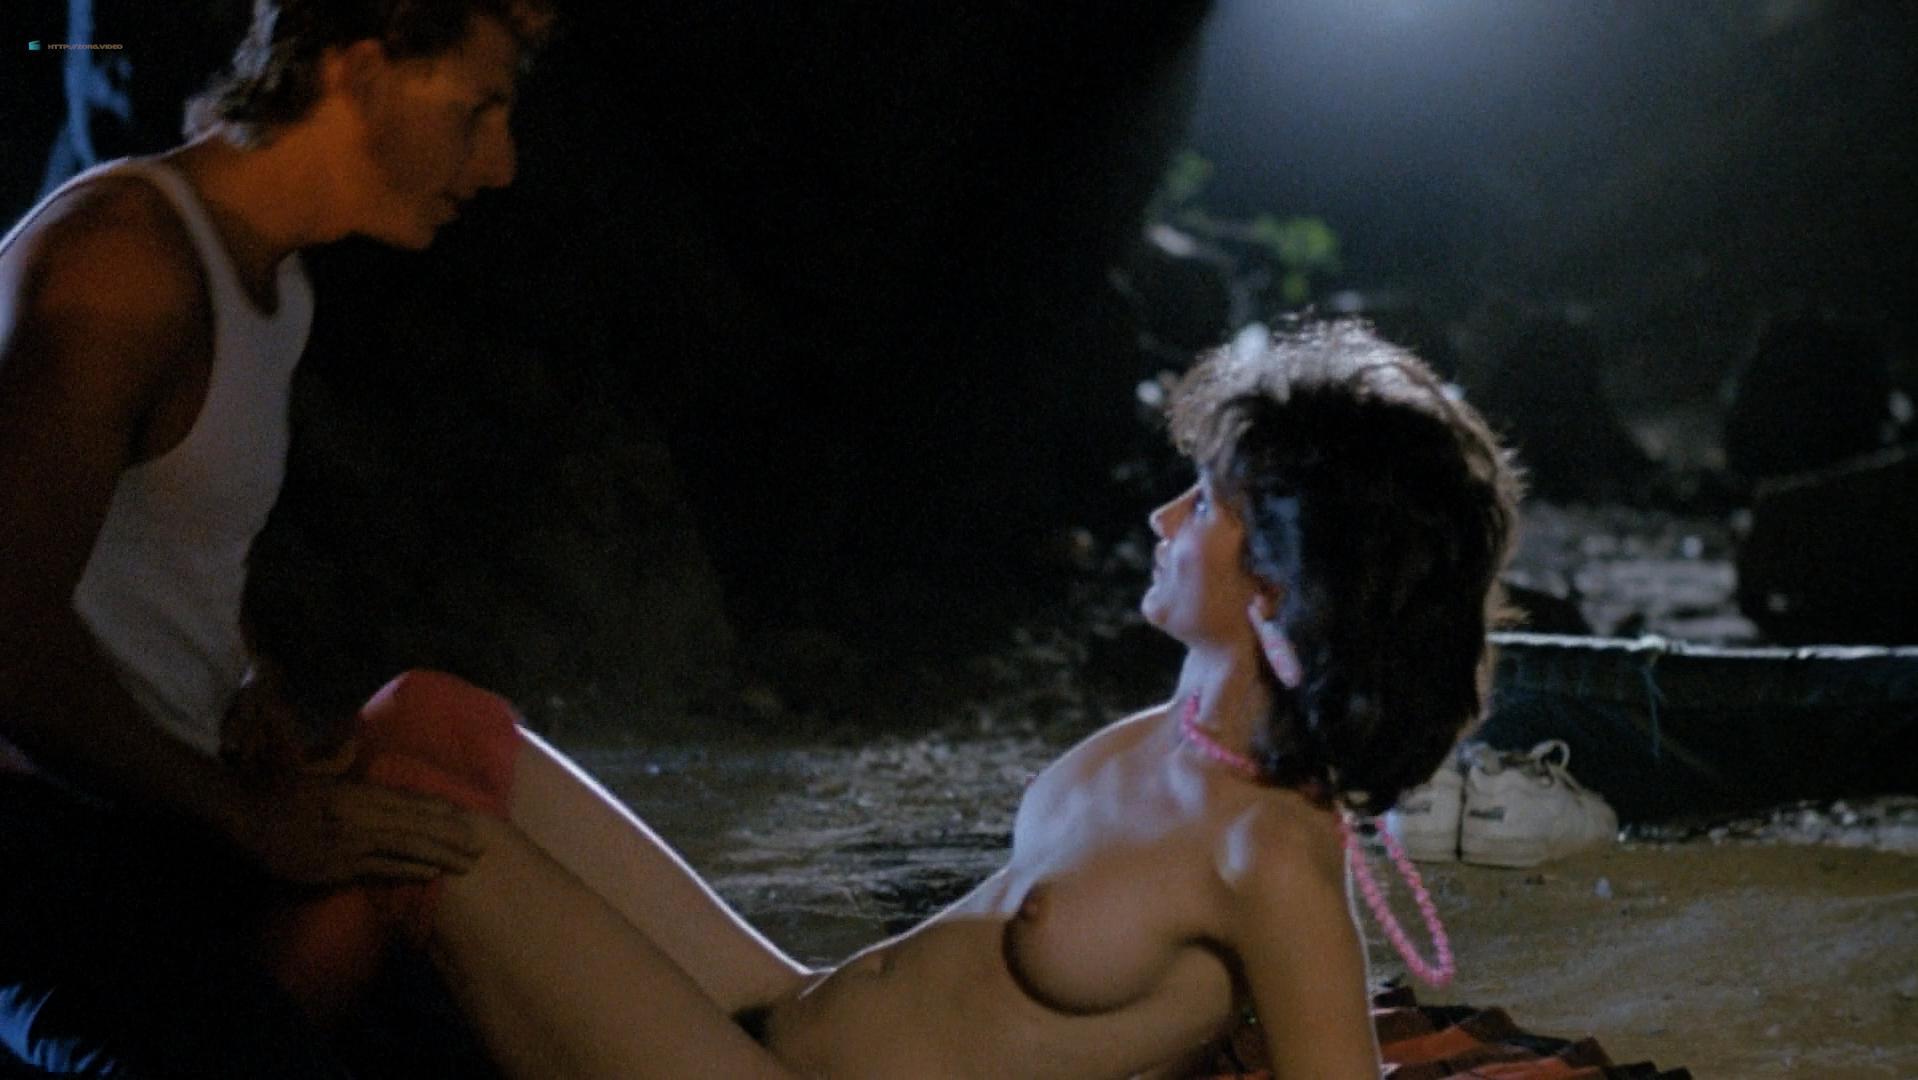 Cynthia Baker nude, Tanya Papanicolas nude - Blood Diner (1987)